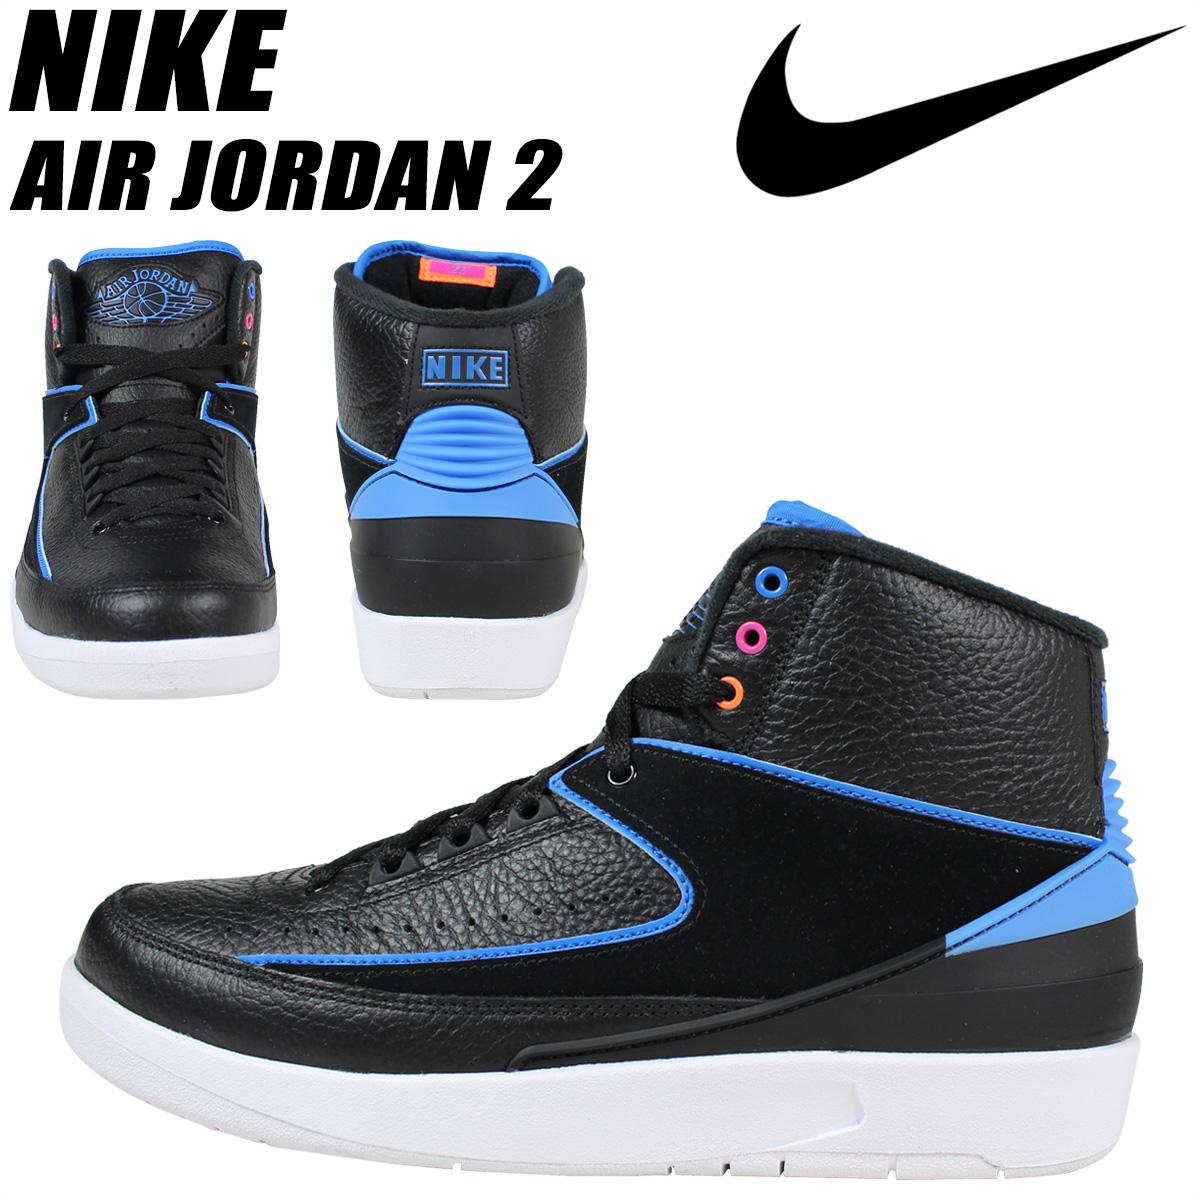 brand new d905a 25e49 NIKE Nike Air Jordan sneakers AIR JORDAN 2 RETRO Air Jordan 2 nostalgic  834,274-014 men's shoes black black